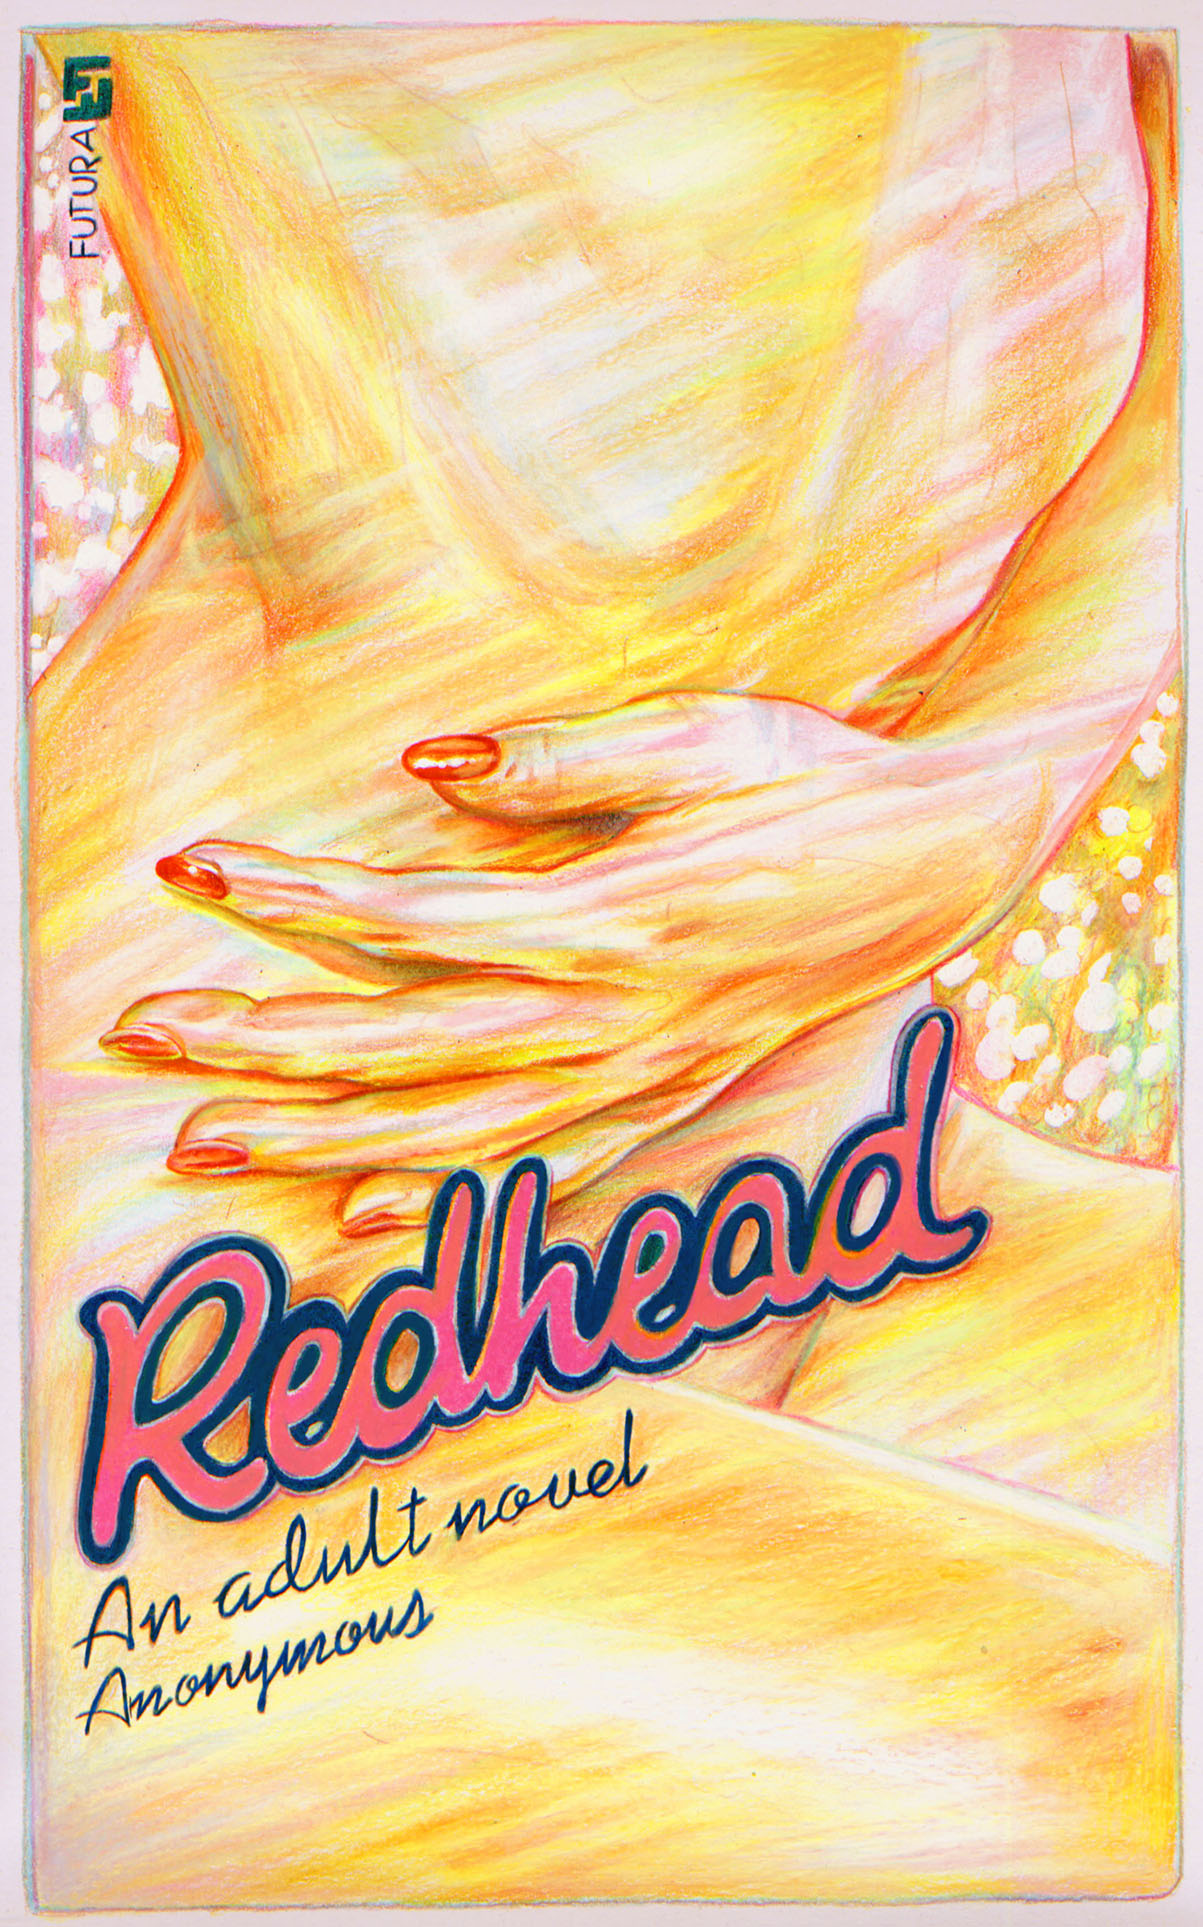 Redhead | Redheard |